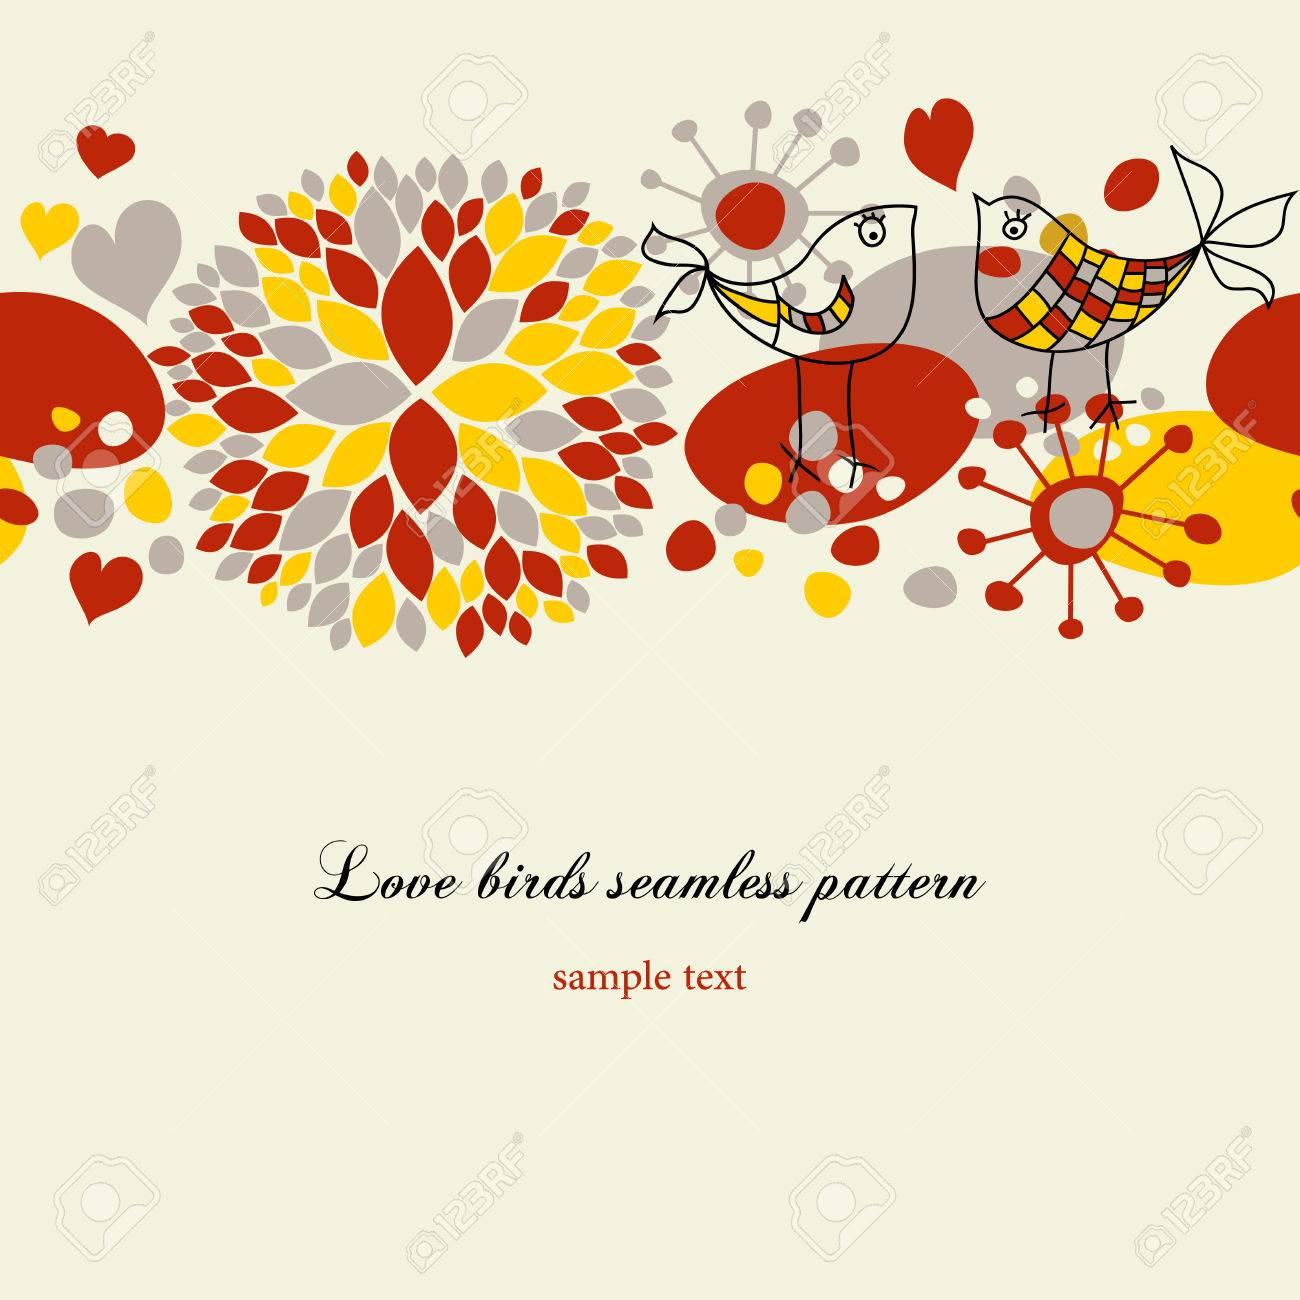 Love birds seamless pattern Stock Vector - 8858463